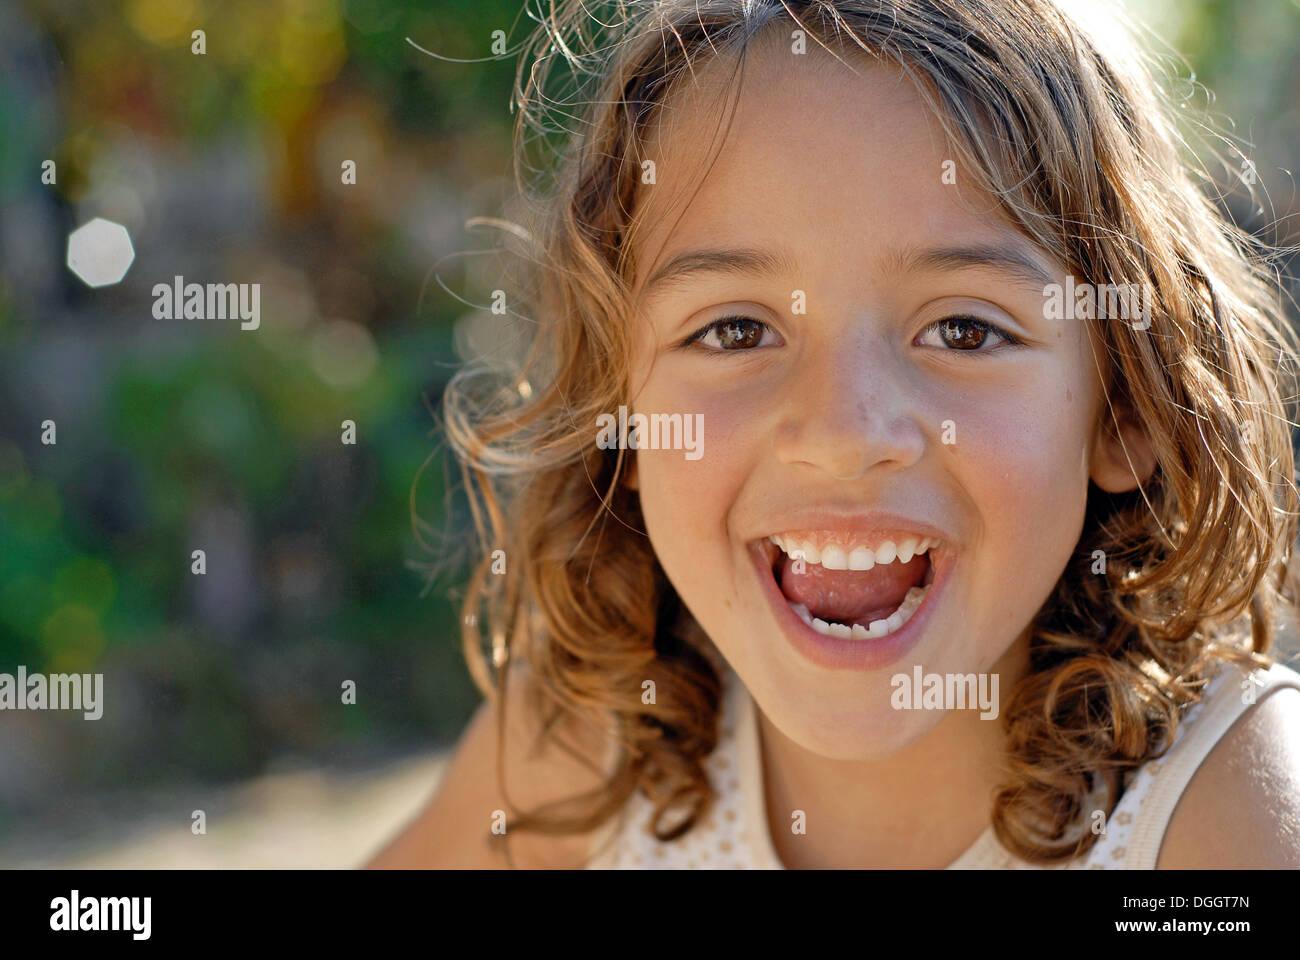 brazilian kids stock photos & brazilian kids stock images - alamy